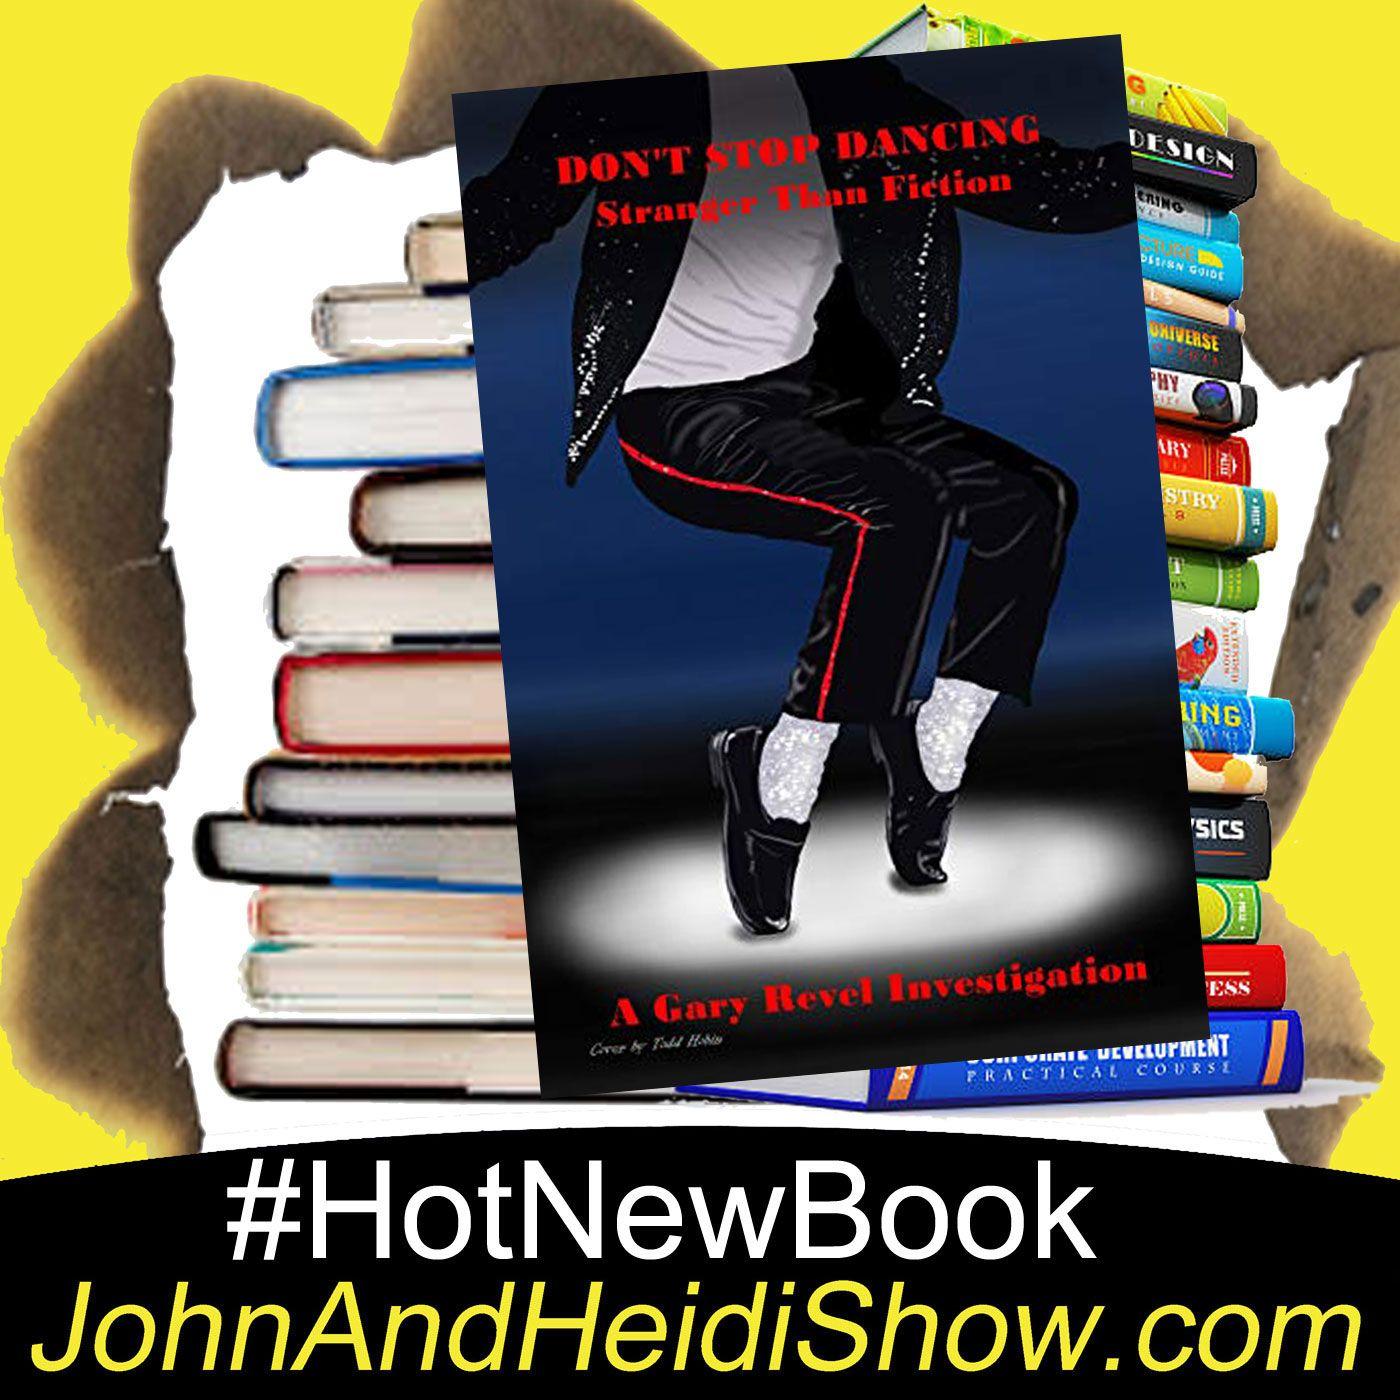 09-26-20-John And Heidi Show-GaryRevel-DontStopDancing